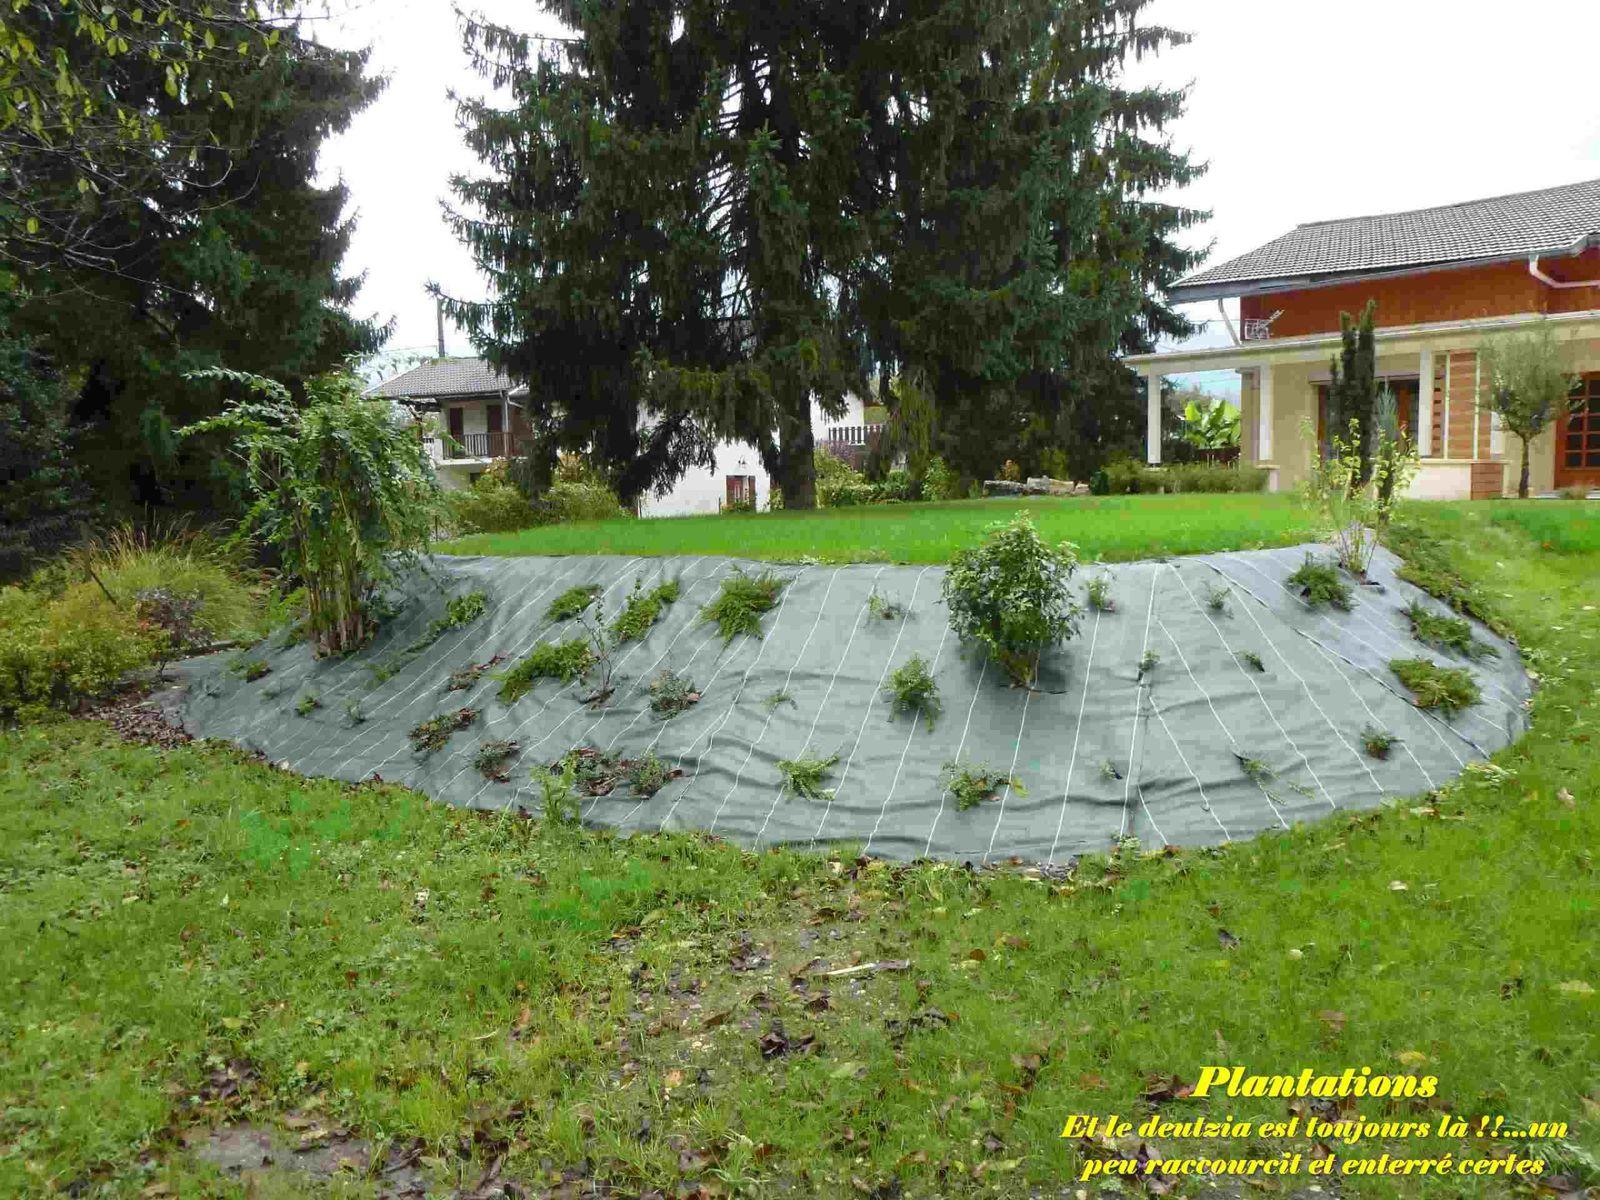 Cr ation d 39 un jardin paysager ricaud paysage - Creation de jardin paysager ...